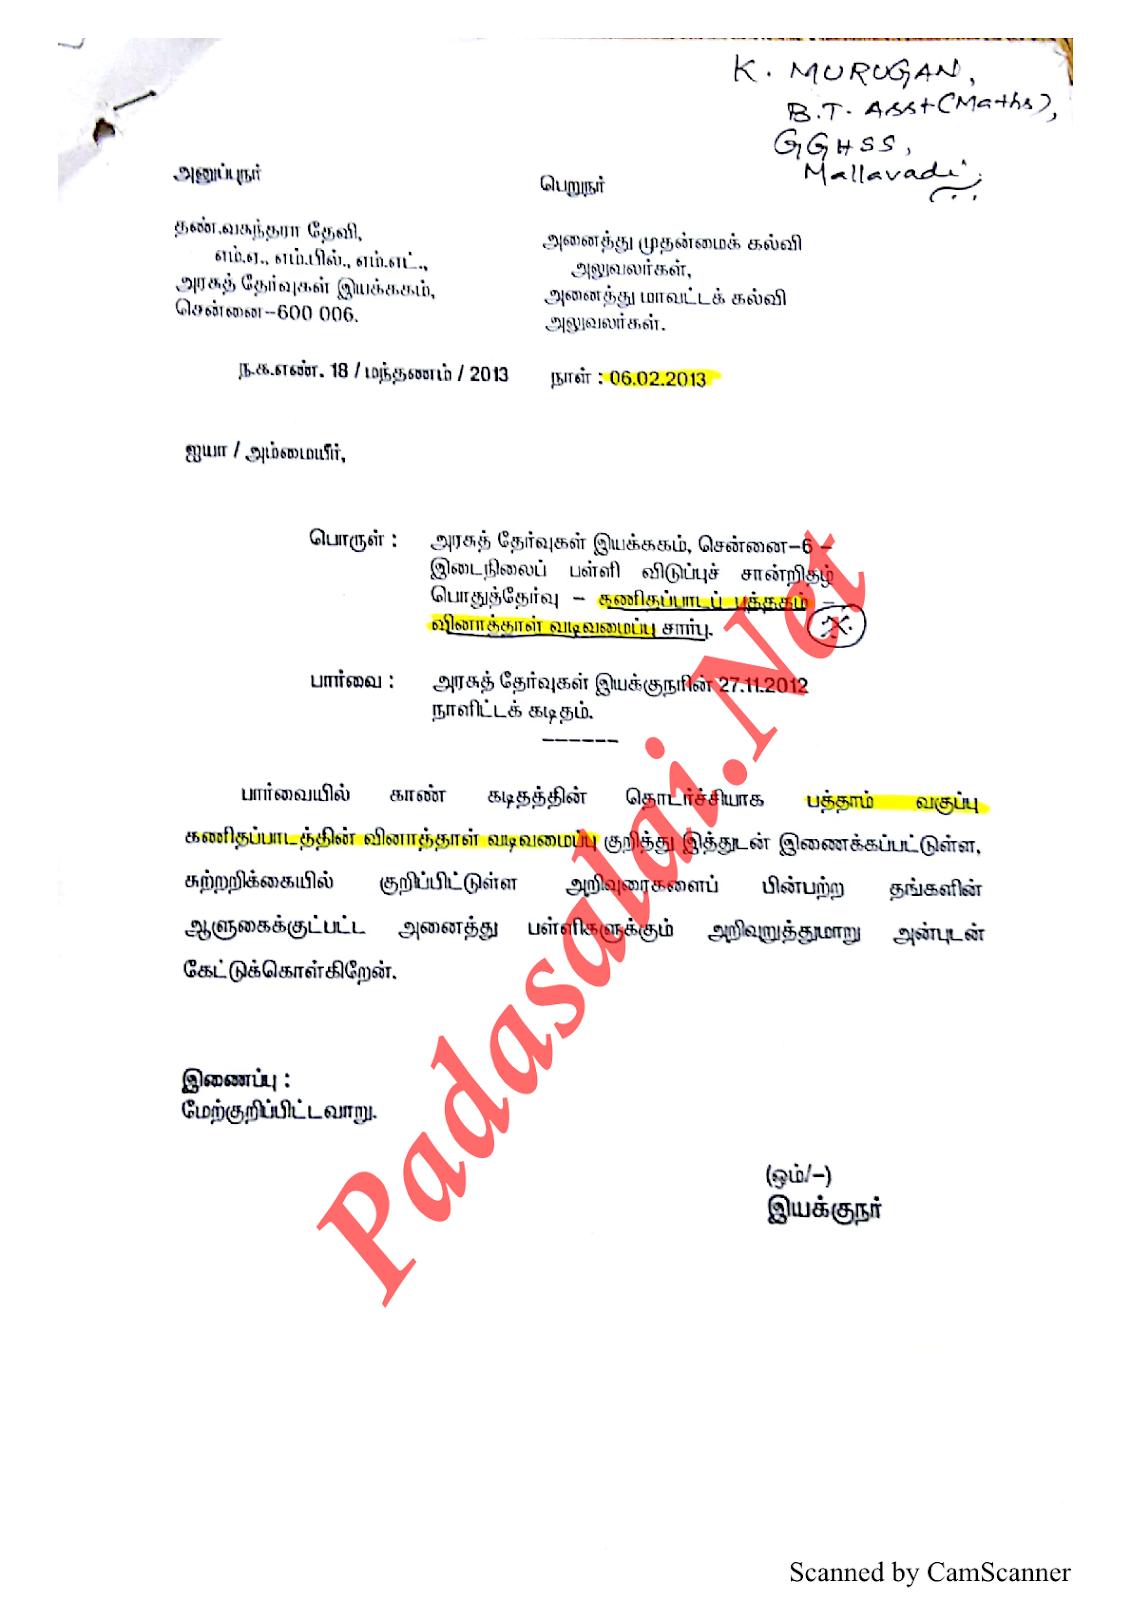 10th maths exam blue print regards clarification date 622013 10th maths exam blue print regards clarification date 622013 malvernweather Gallery